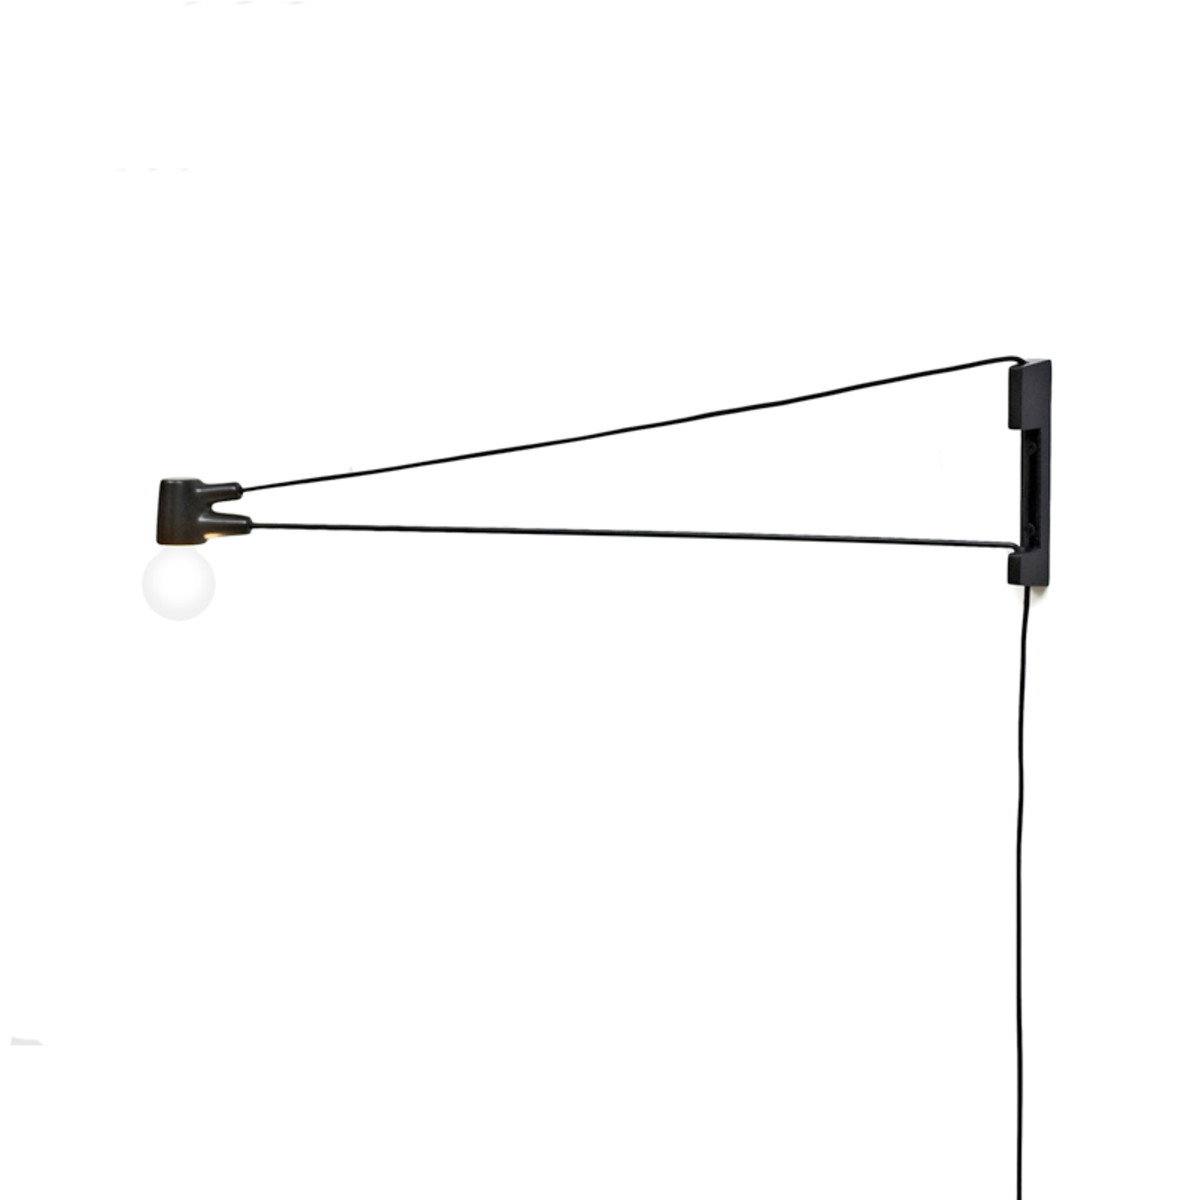 Cord-Lamp-Brendan-Ravenhill-TRNK